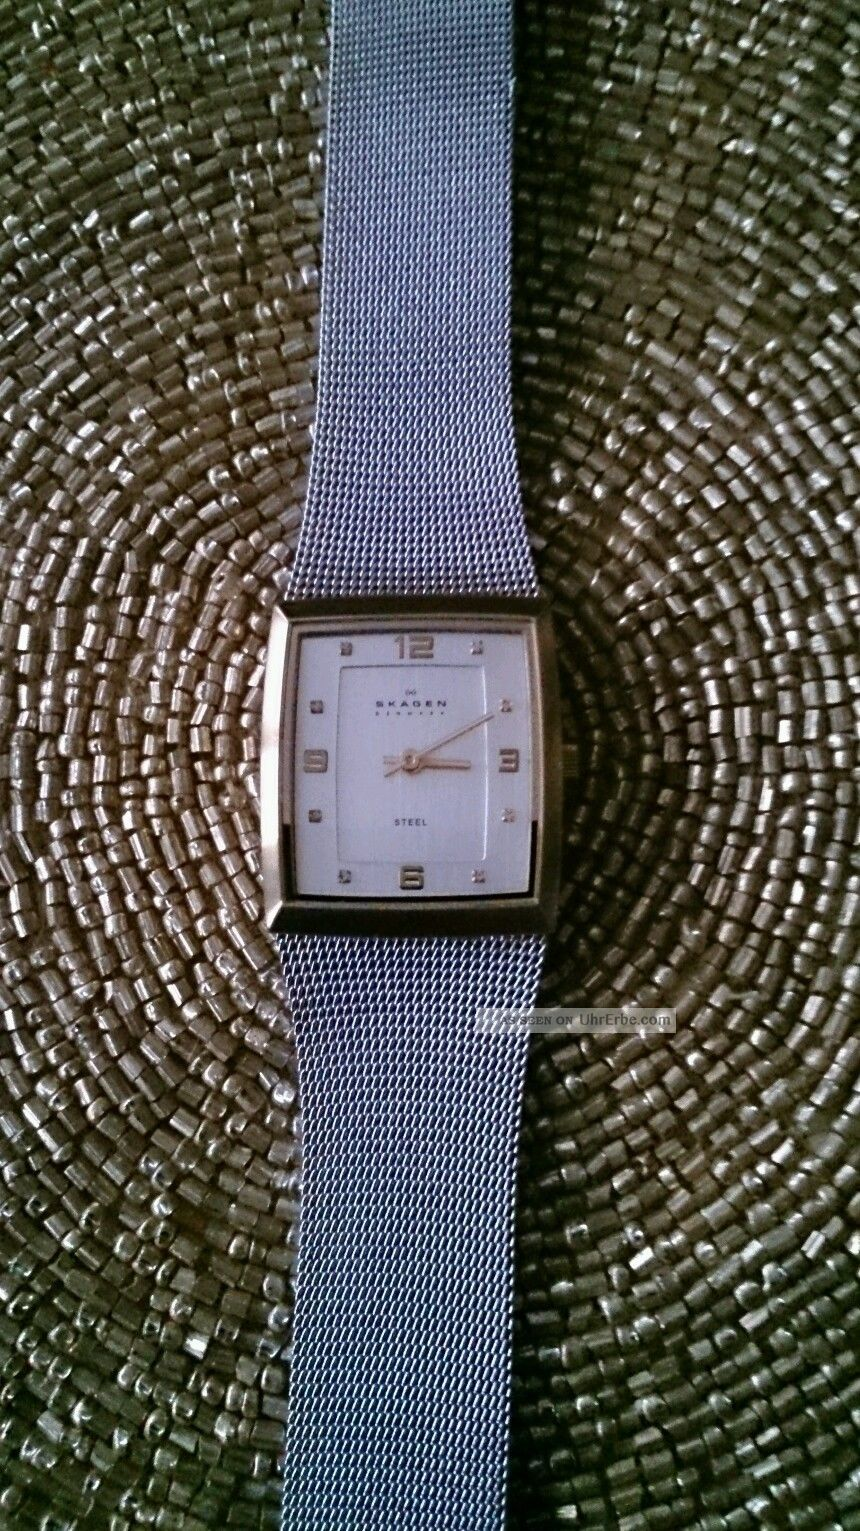 Skagen Damen Uhr Gold Silber 523sgs Armbanduhren Bild